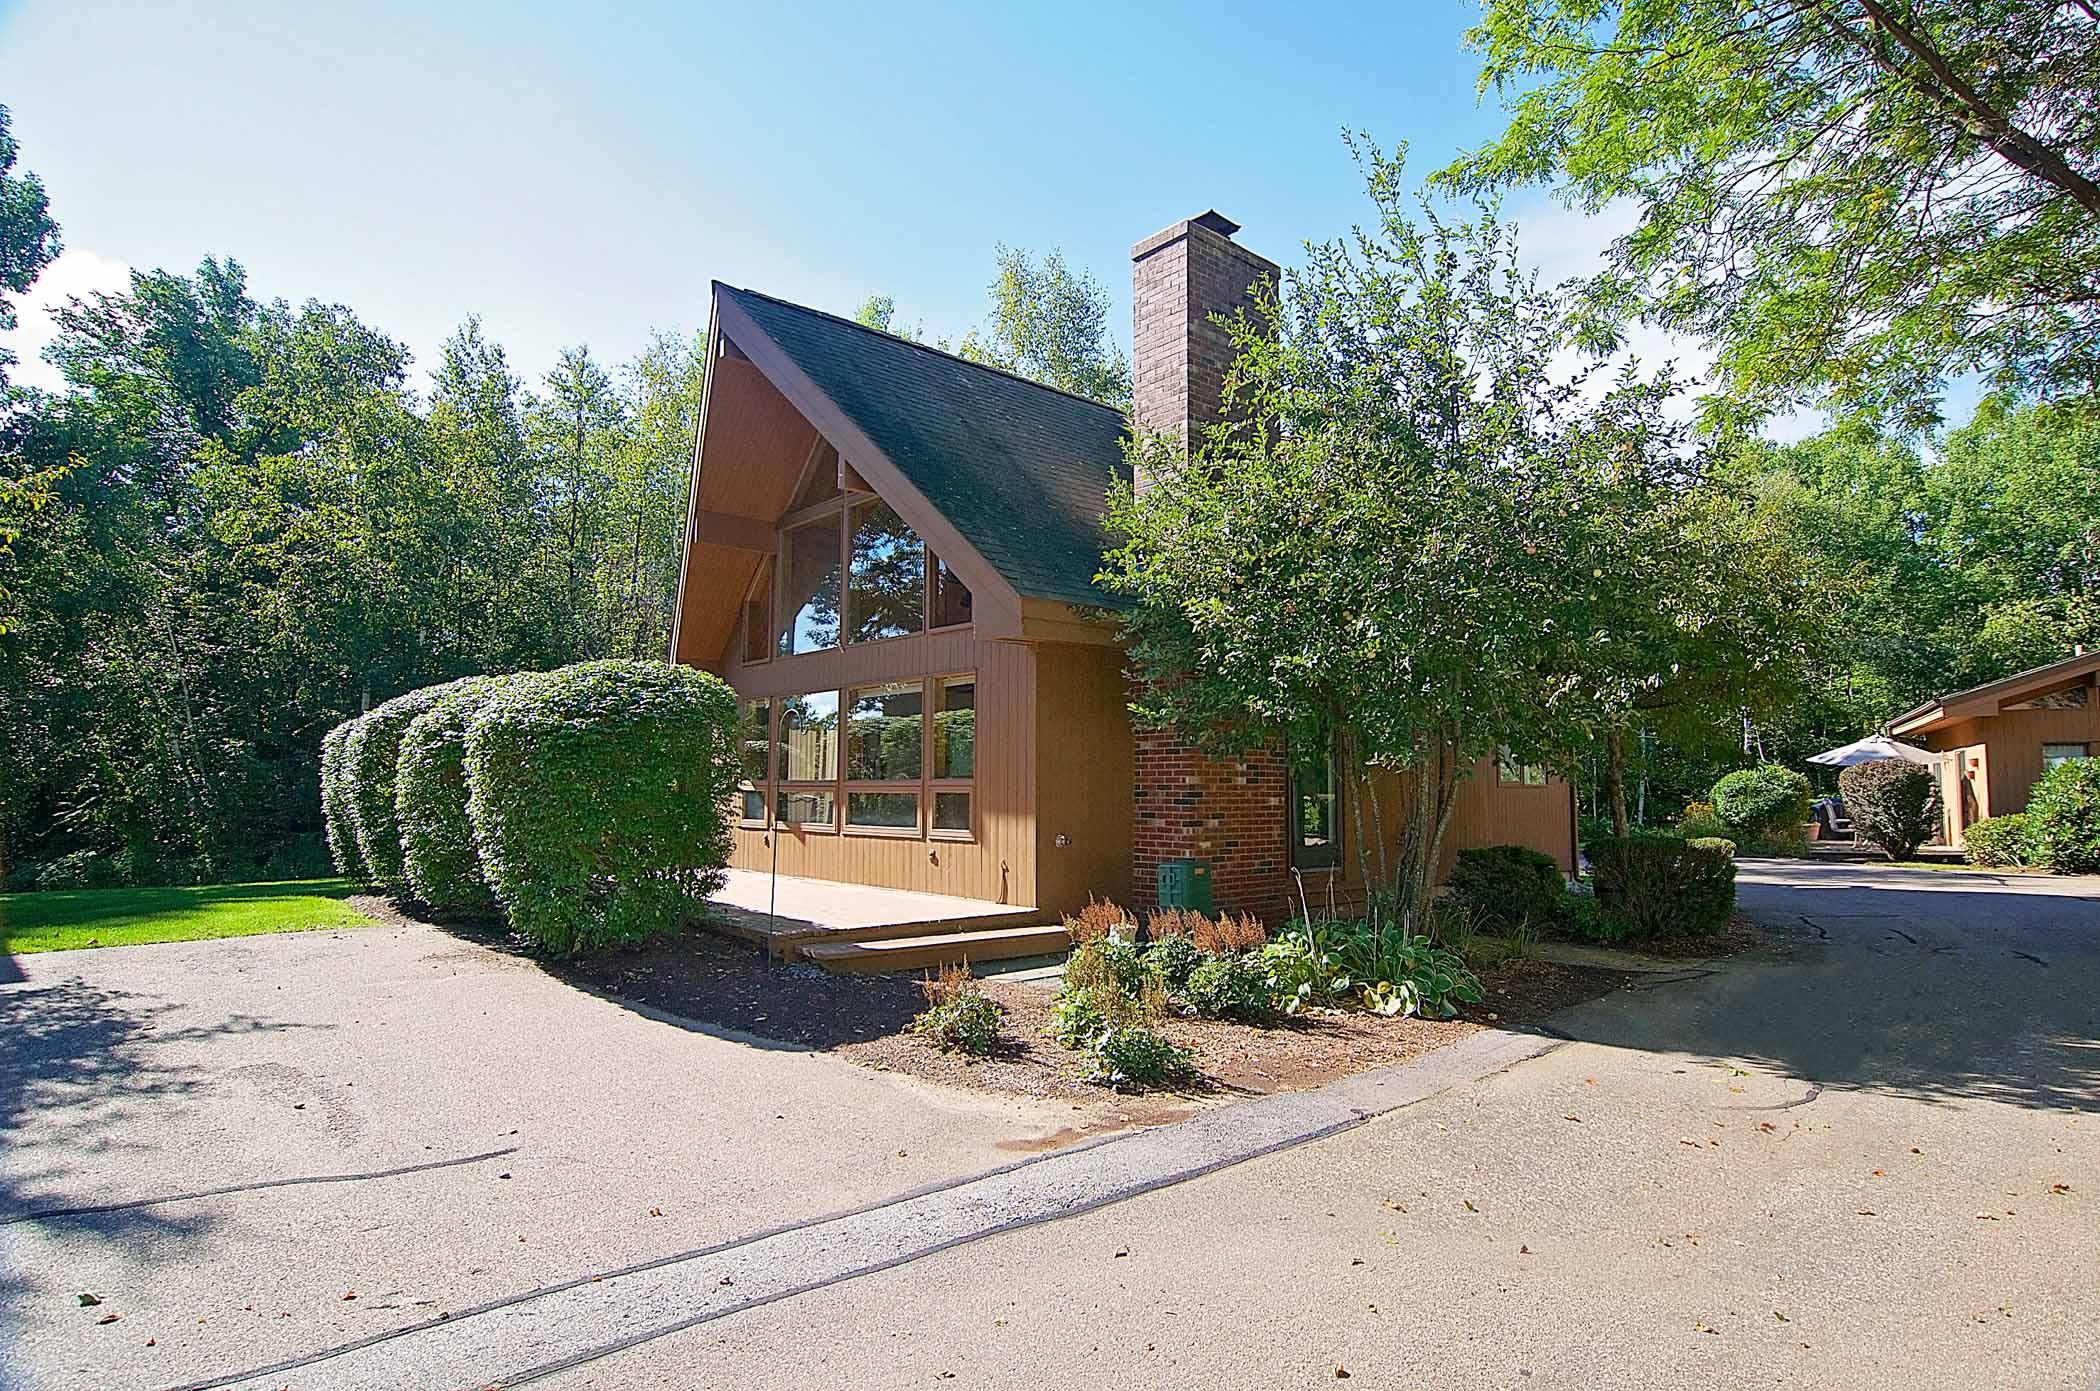 Condominium for Sale at 18 Croft, Laconia 18 Croft Way Laconia, New Hampshire 03246 United States